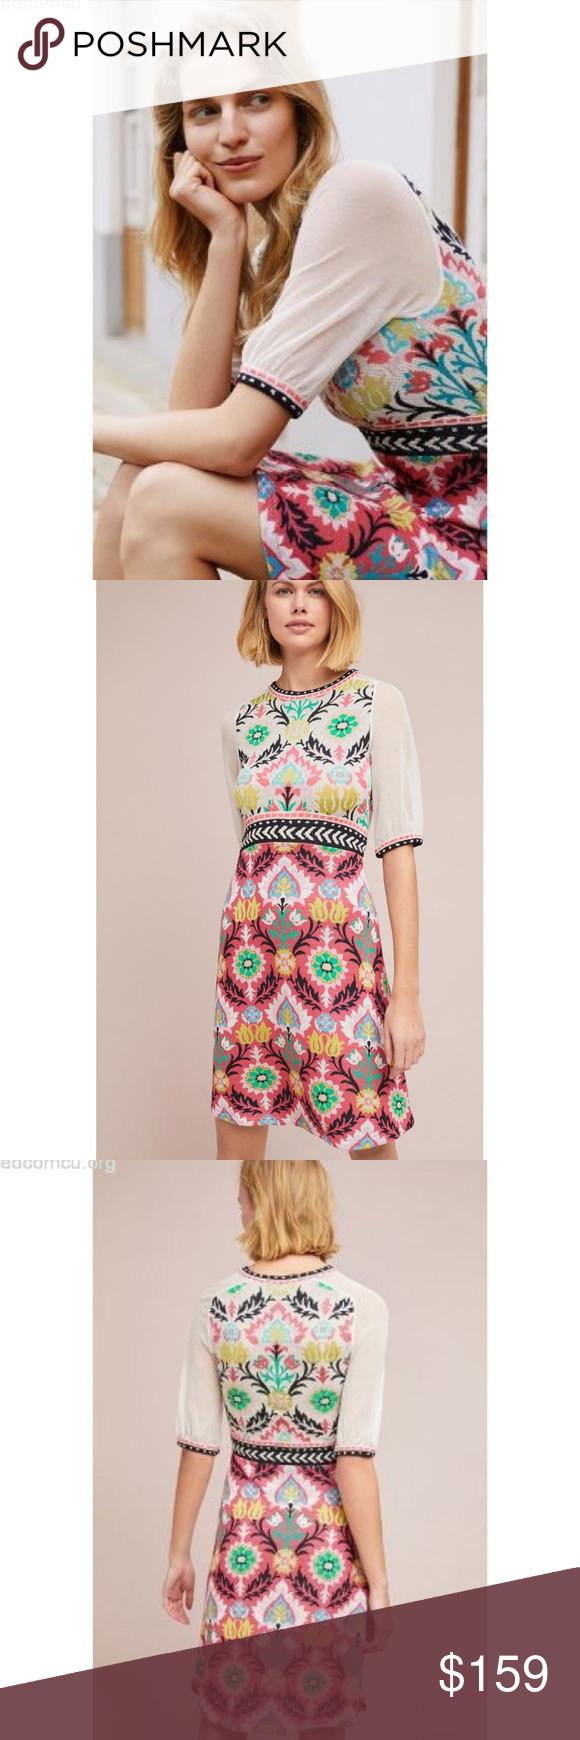 1518816d50fa HTF NWT ANTHROPOLOGIE Winona Knit Dress HTF Brand new with tags NWT  ANTHROPOLOGIE Winona Knit Dress